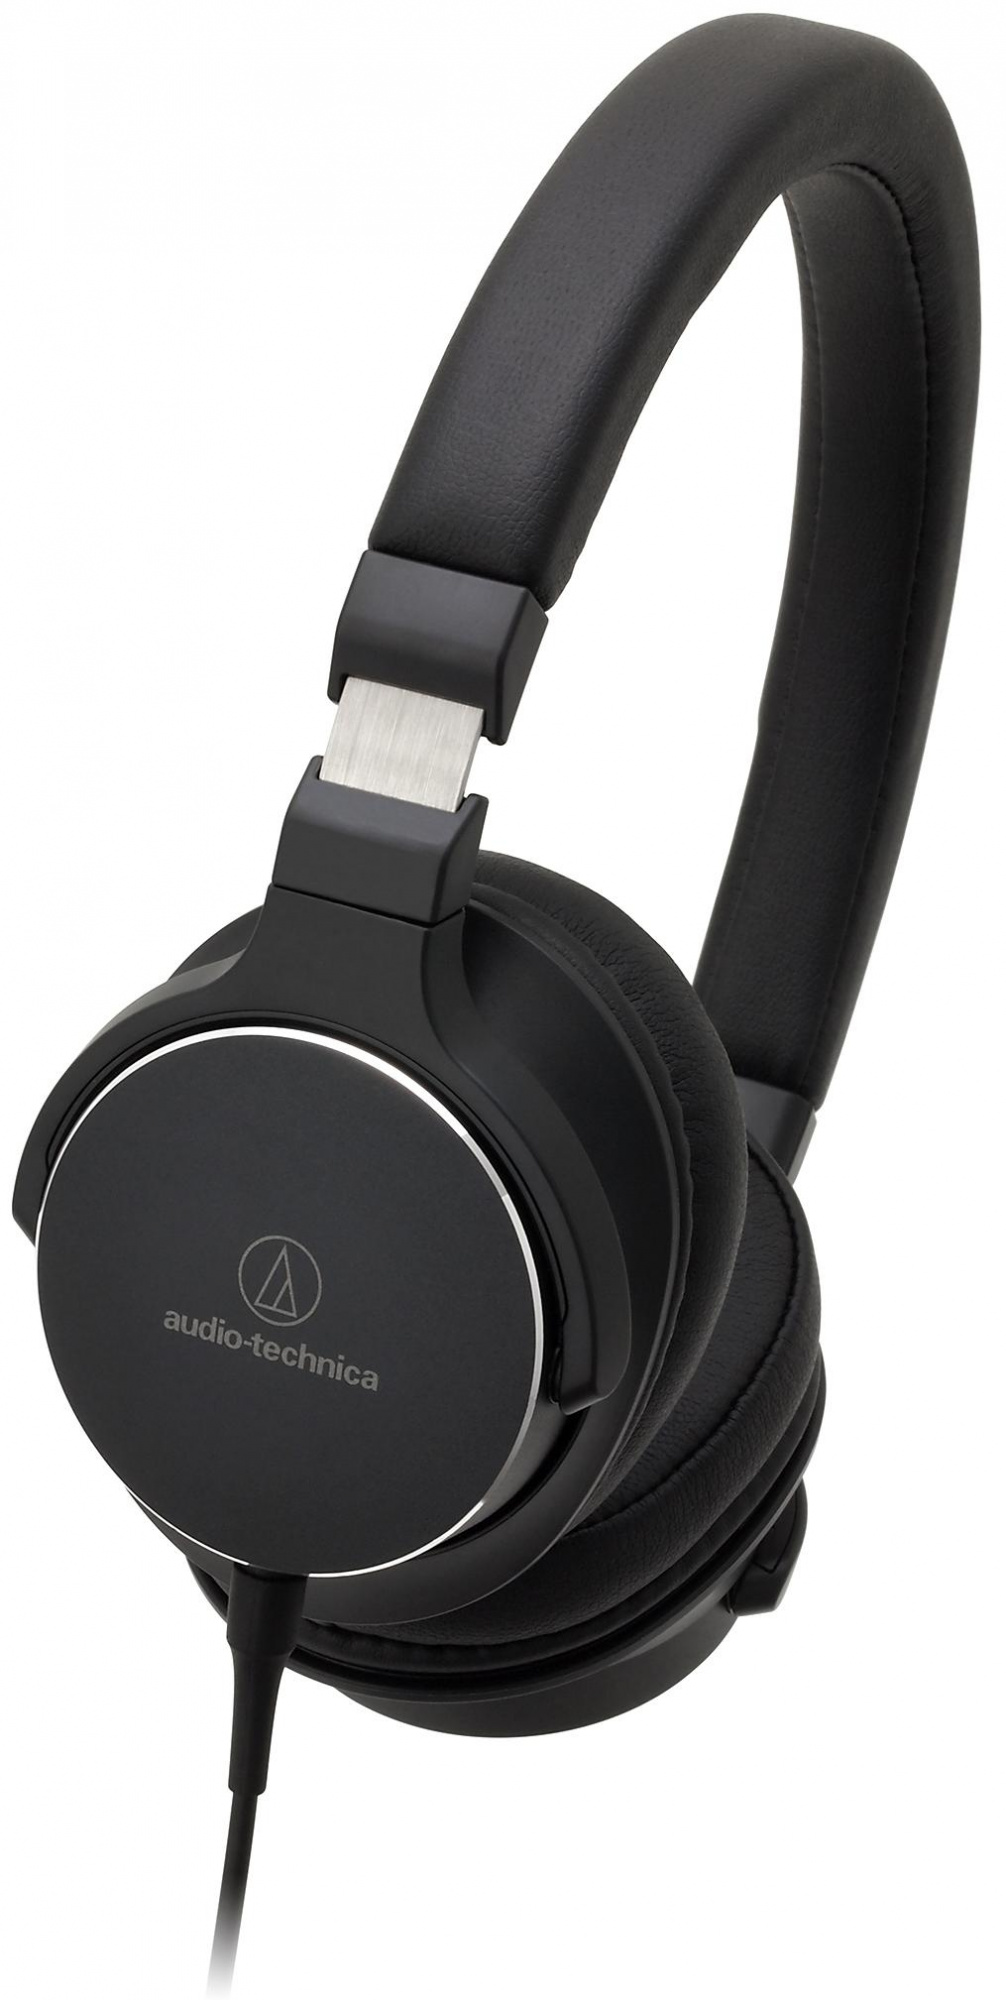 Audio-Technica ATH-SR5 - накладные наушники (Black)